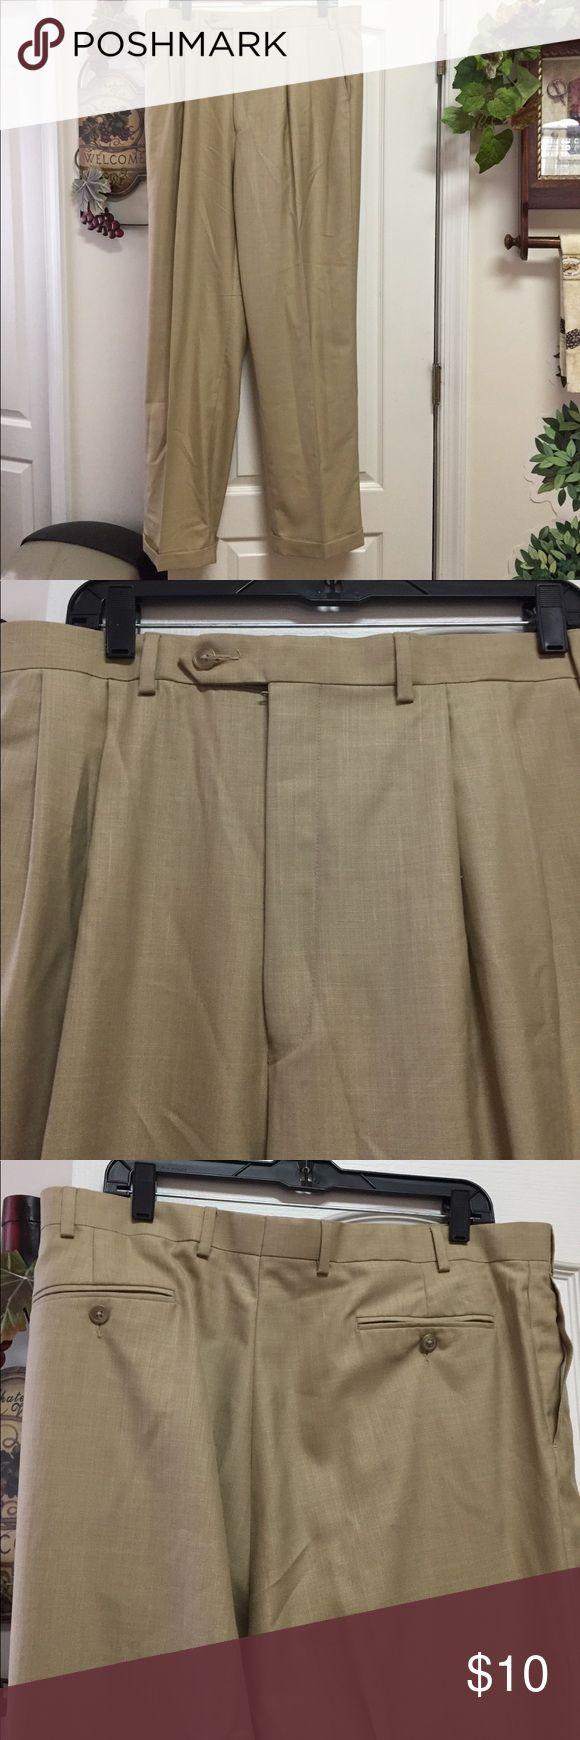 Ralph Lauren Men's Slacks 38/34 polyester/rayon Excellent used condition Ralph Lauren men's slacks. Pleated front, hook and button closure. Cuffed polyester and rayon blend. Ralph Lauren Pants Dress